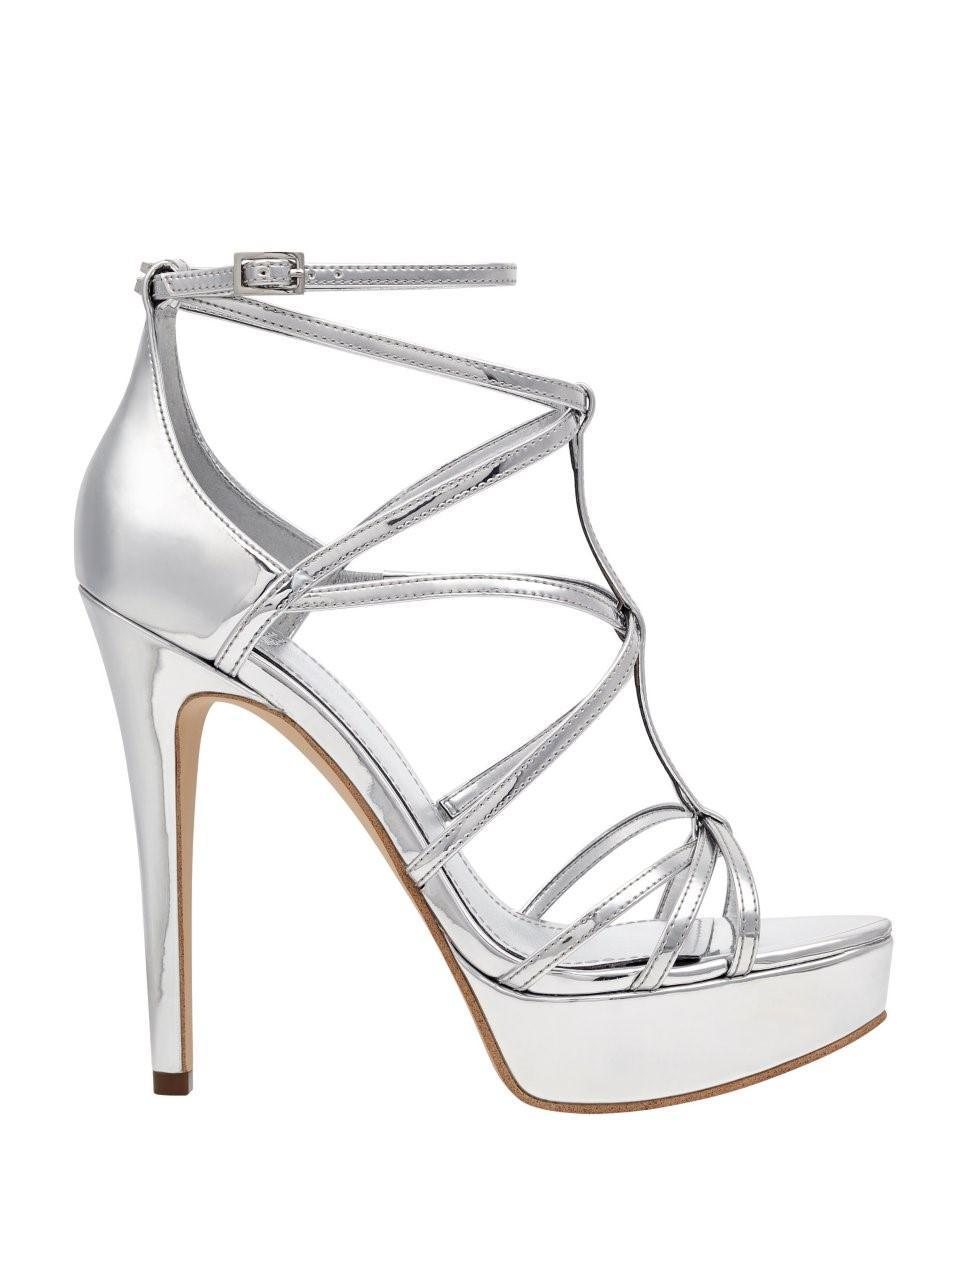 0a699504c15 Lyst - Guess Kico Strappy Platform Heels in Metallic